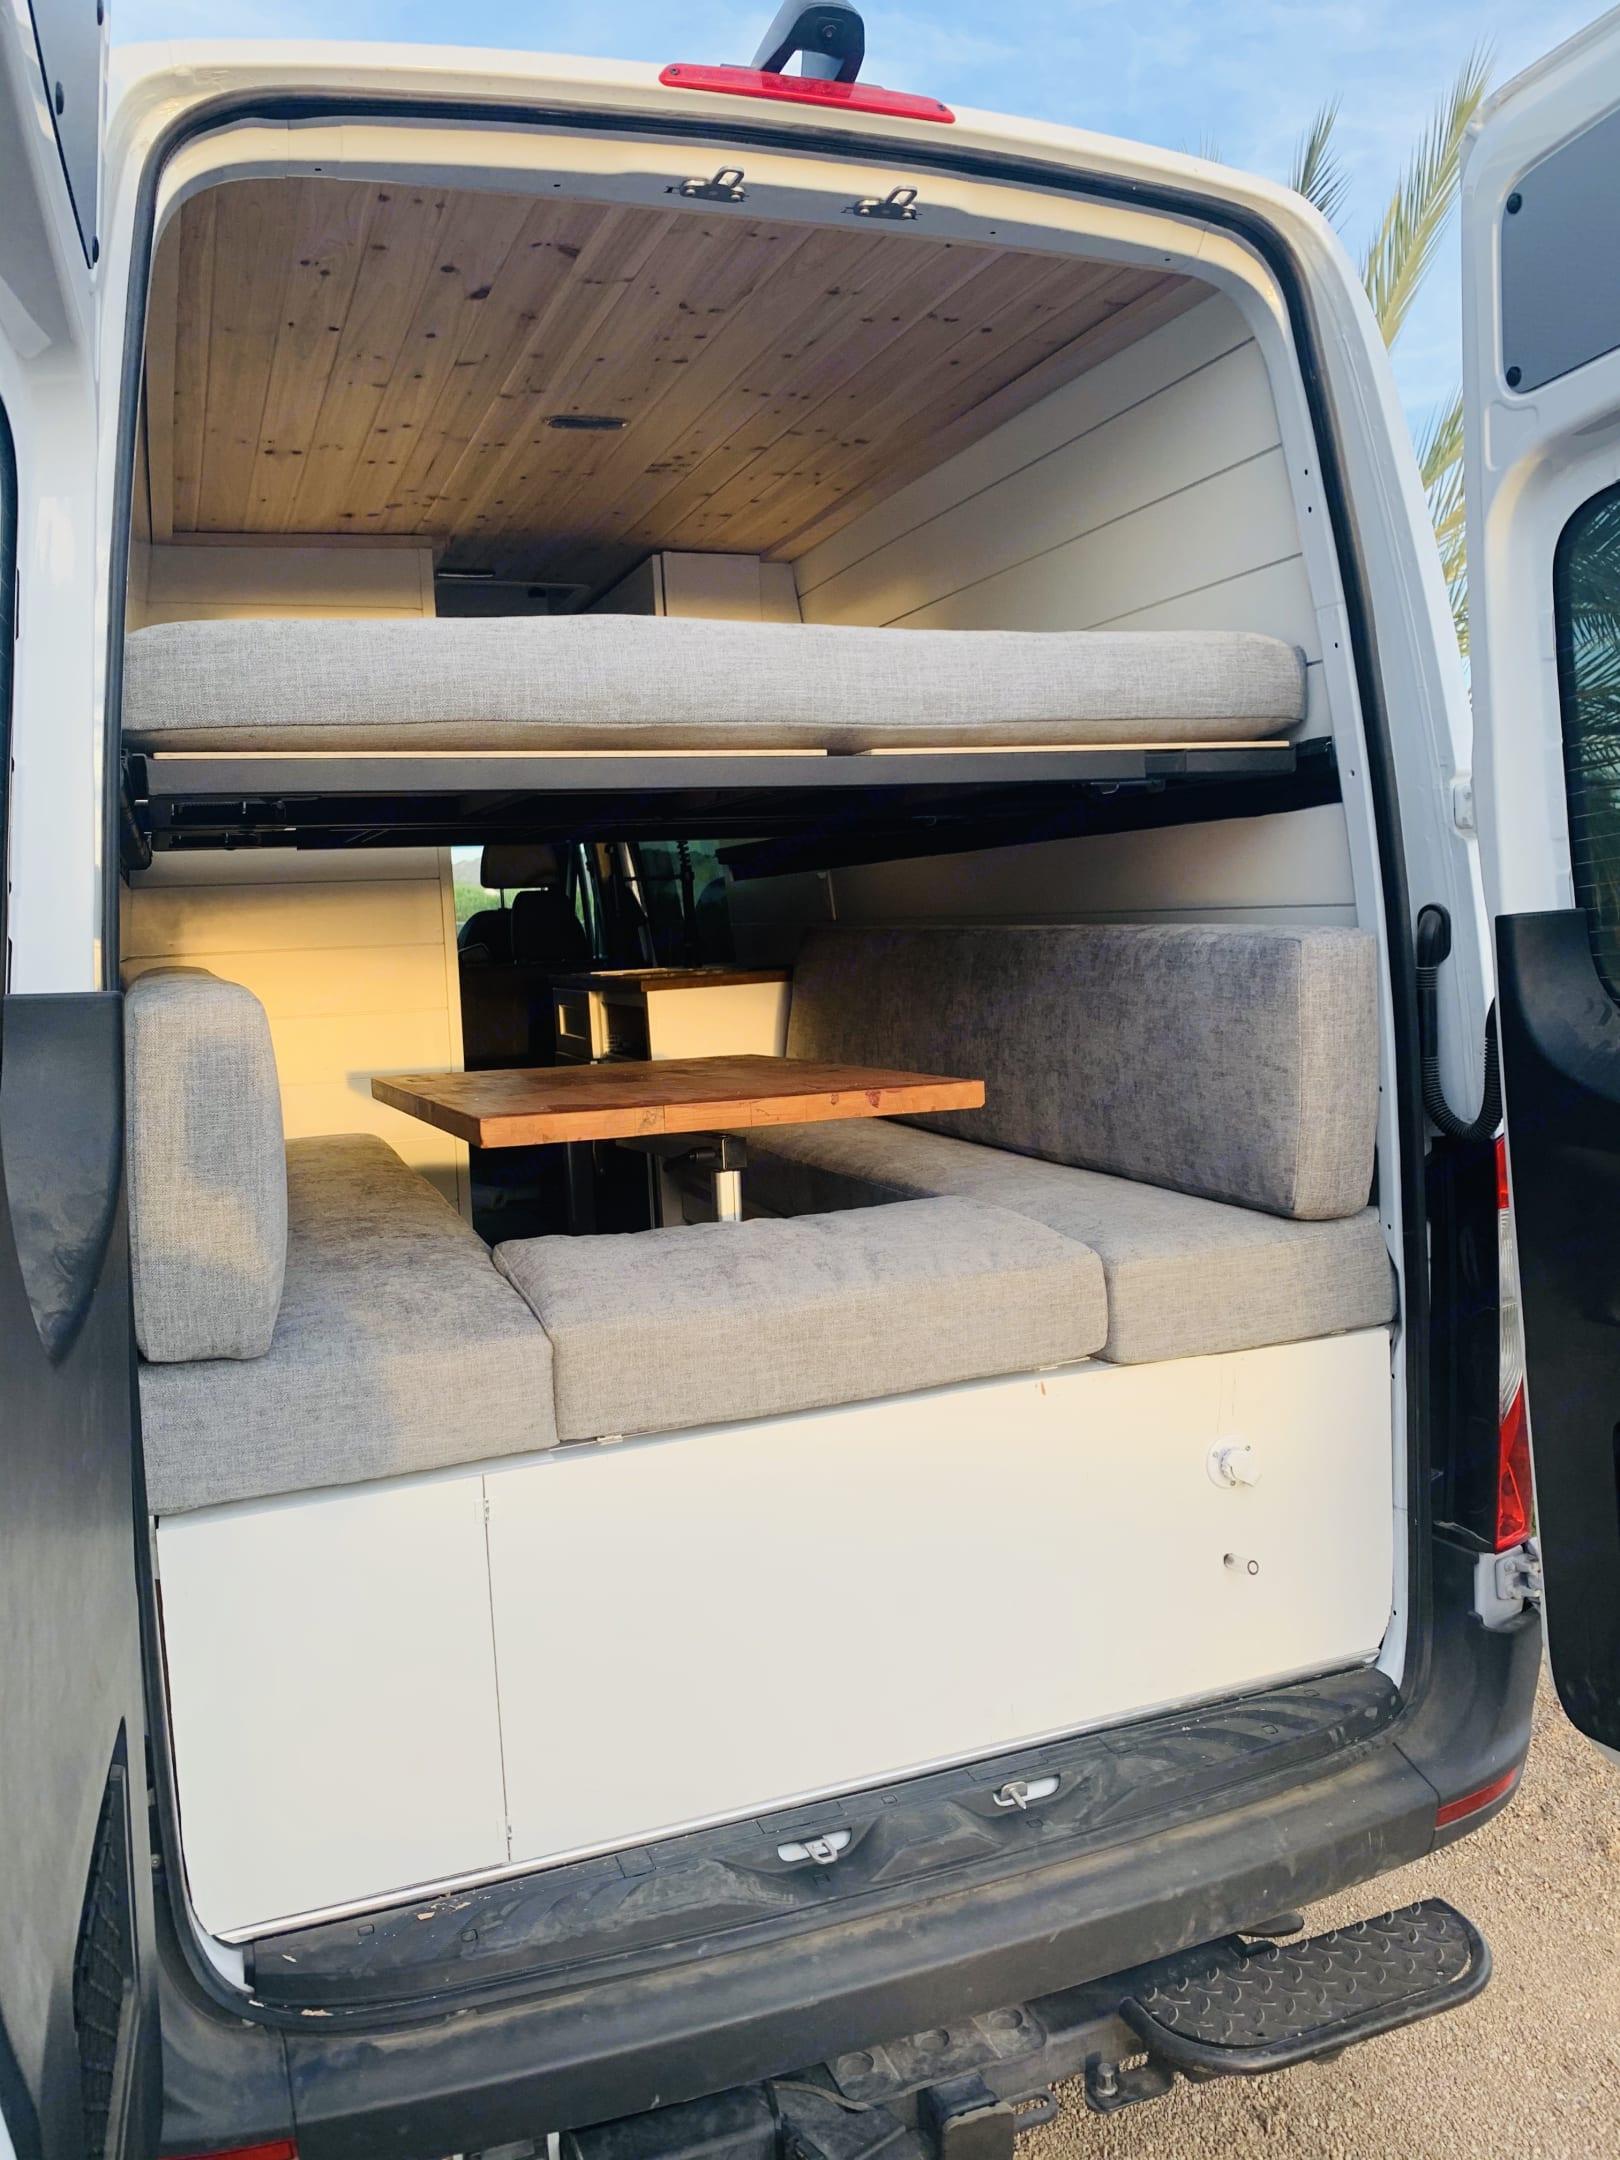 Dinette converts to a queen sleeper. Mercedes-Benz Sprinter RV Motorhome Campervan 2020